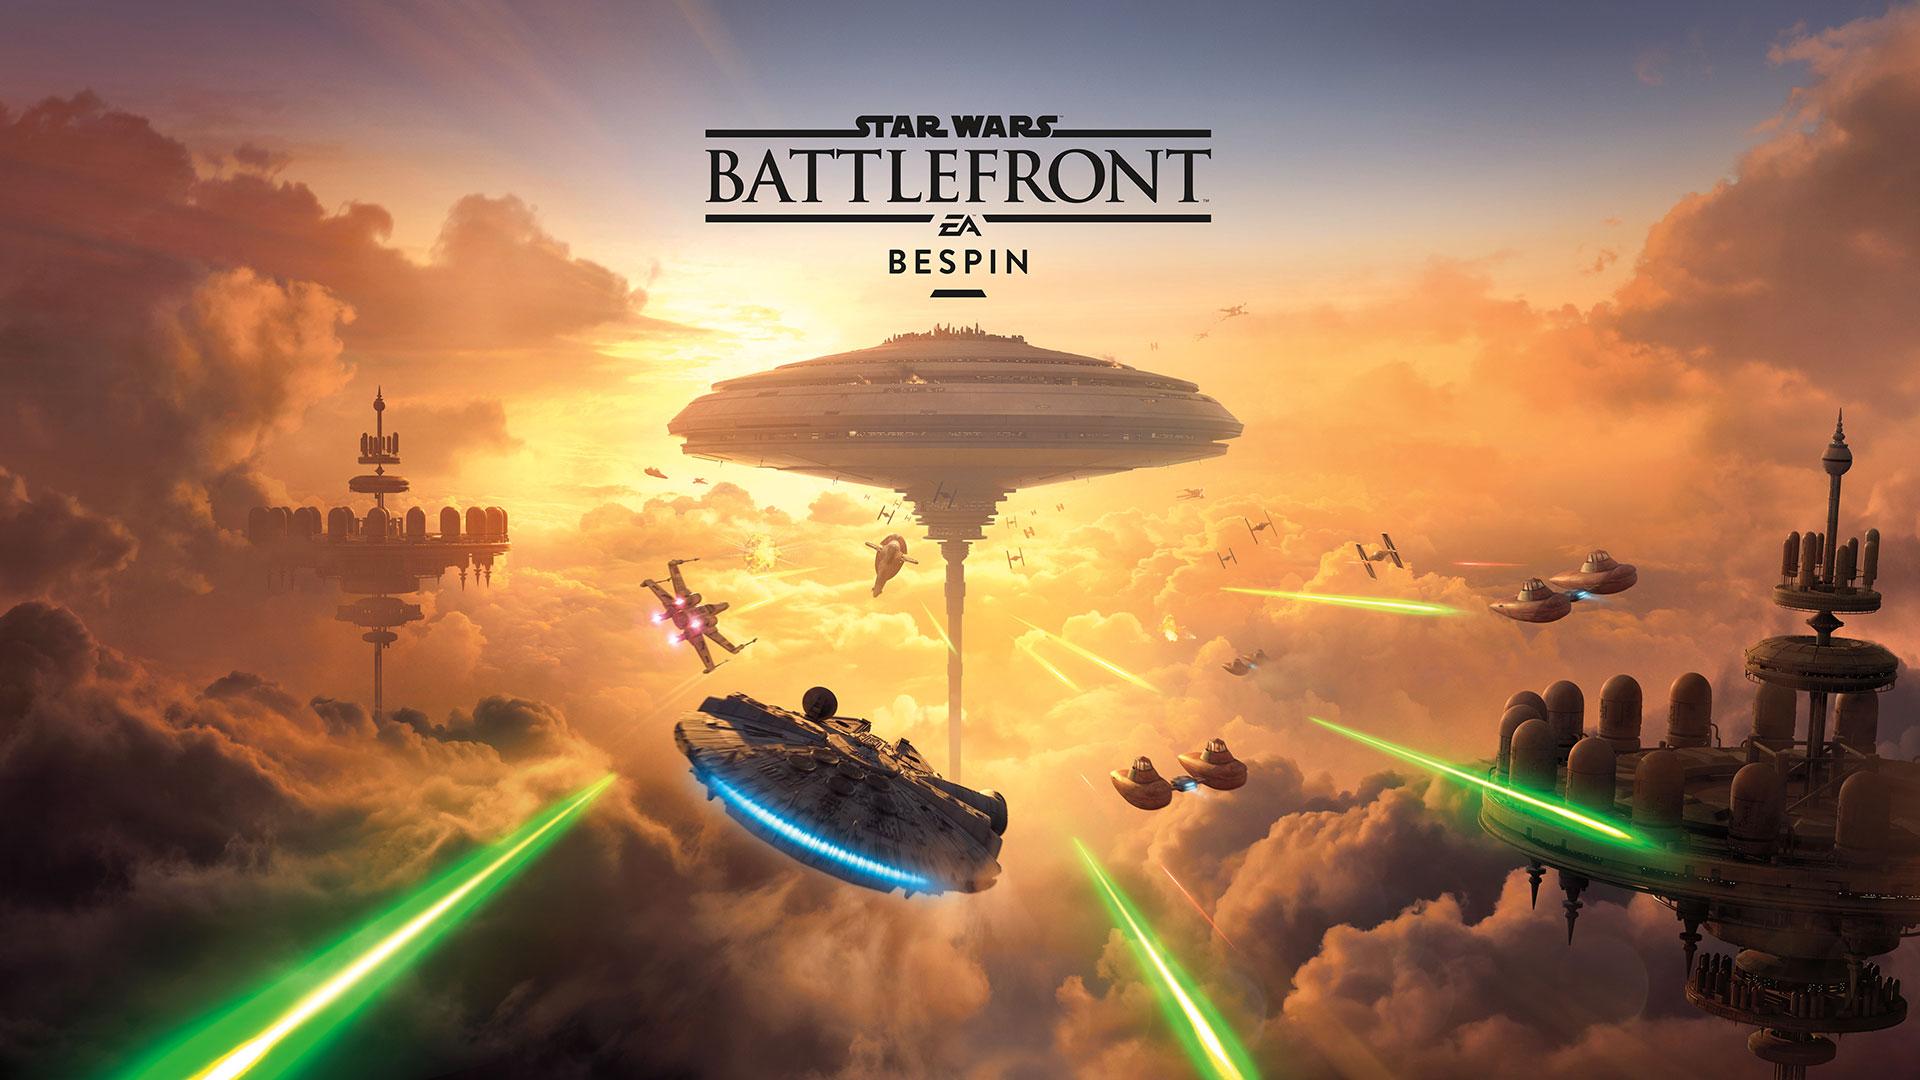 Star Wars Battlefront - Second DLC Bespin Release Date & Details